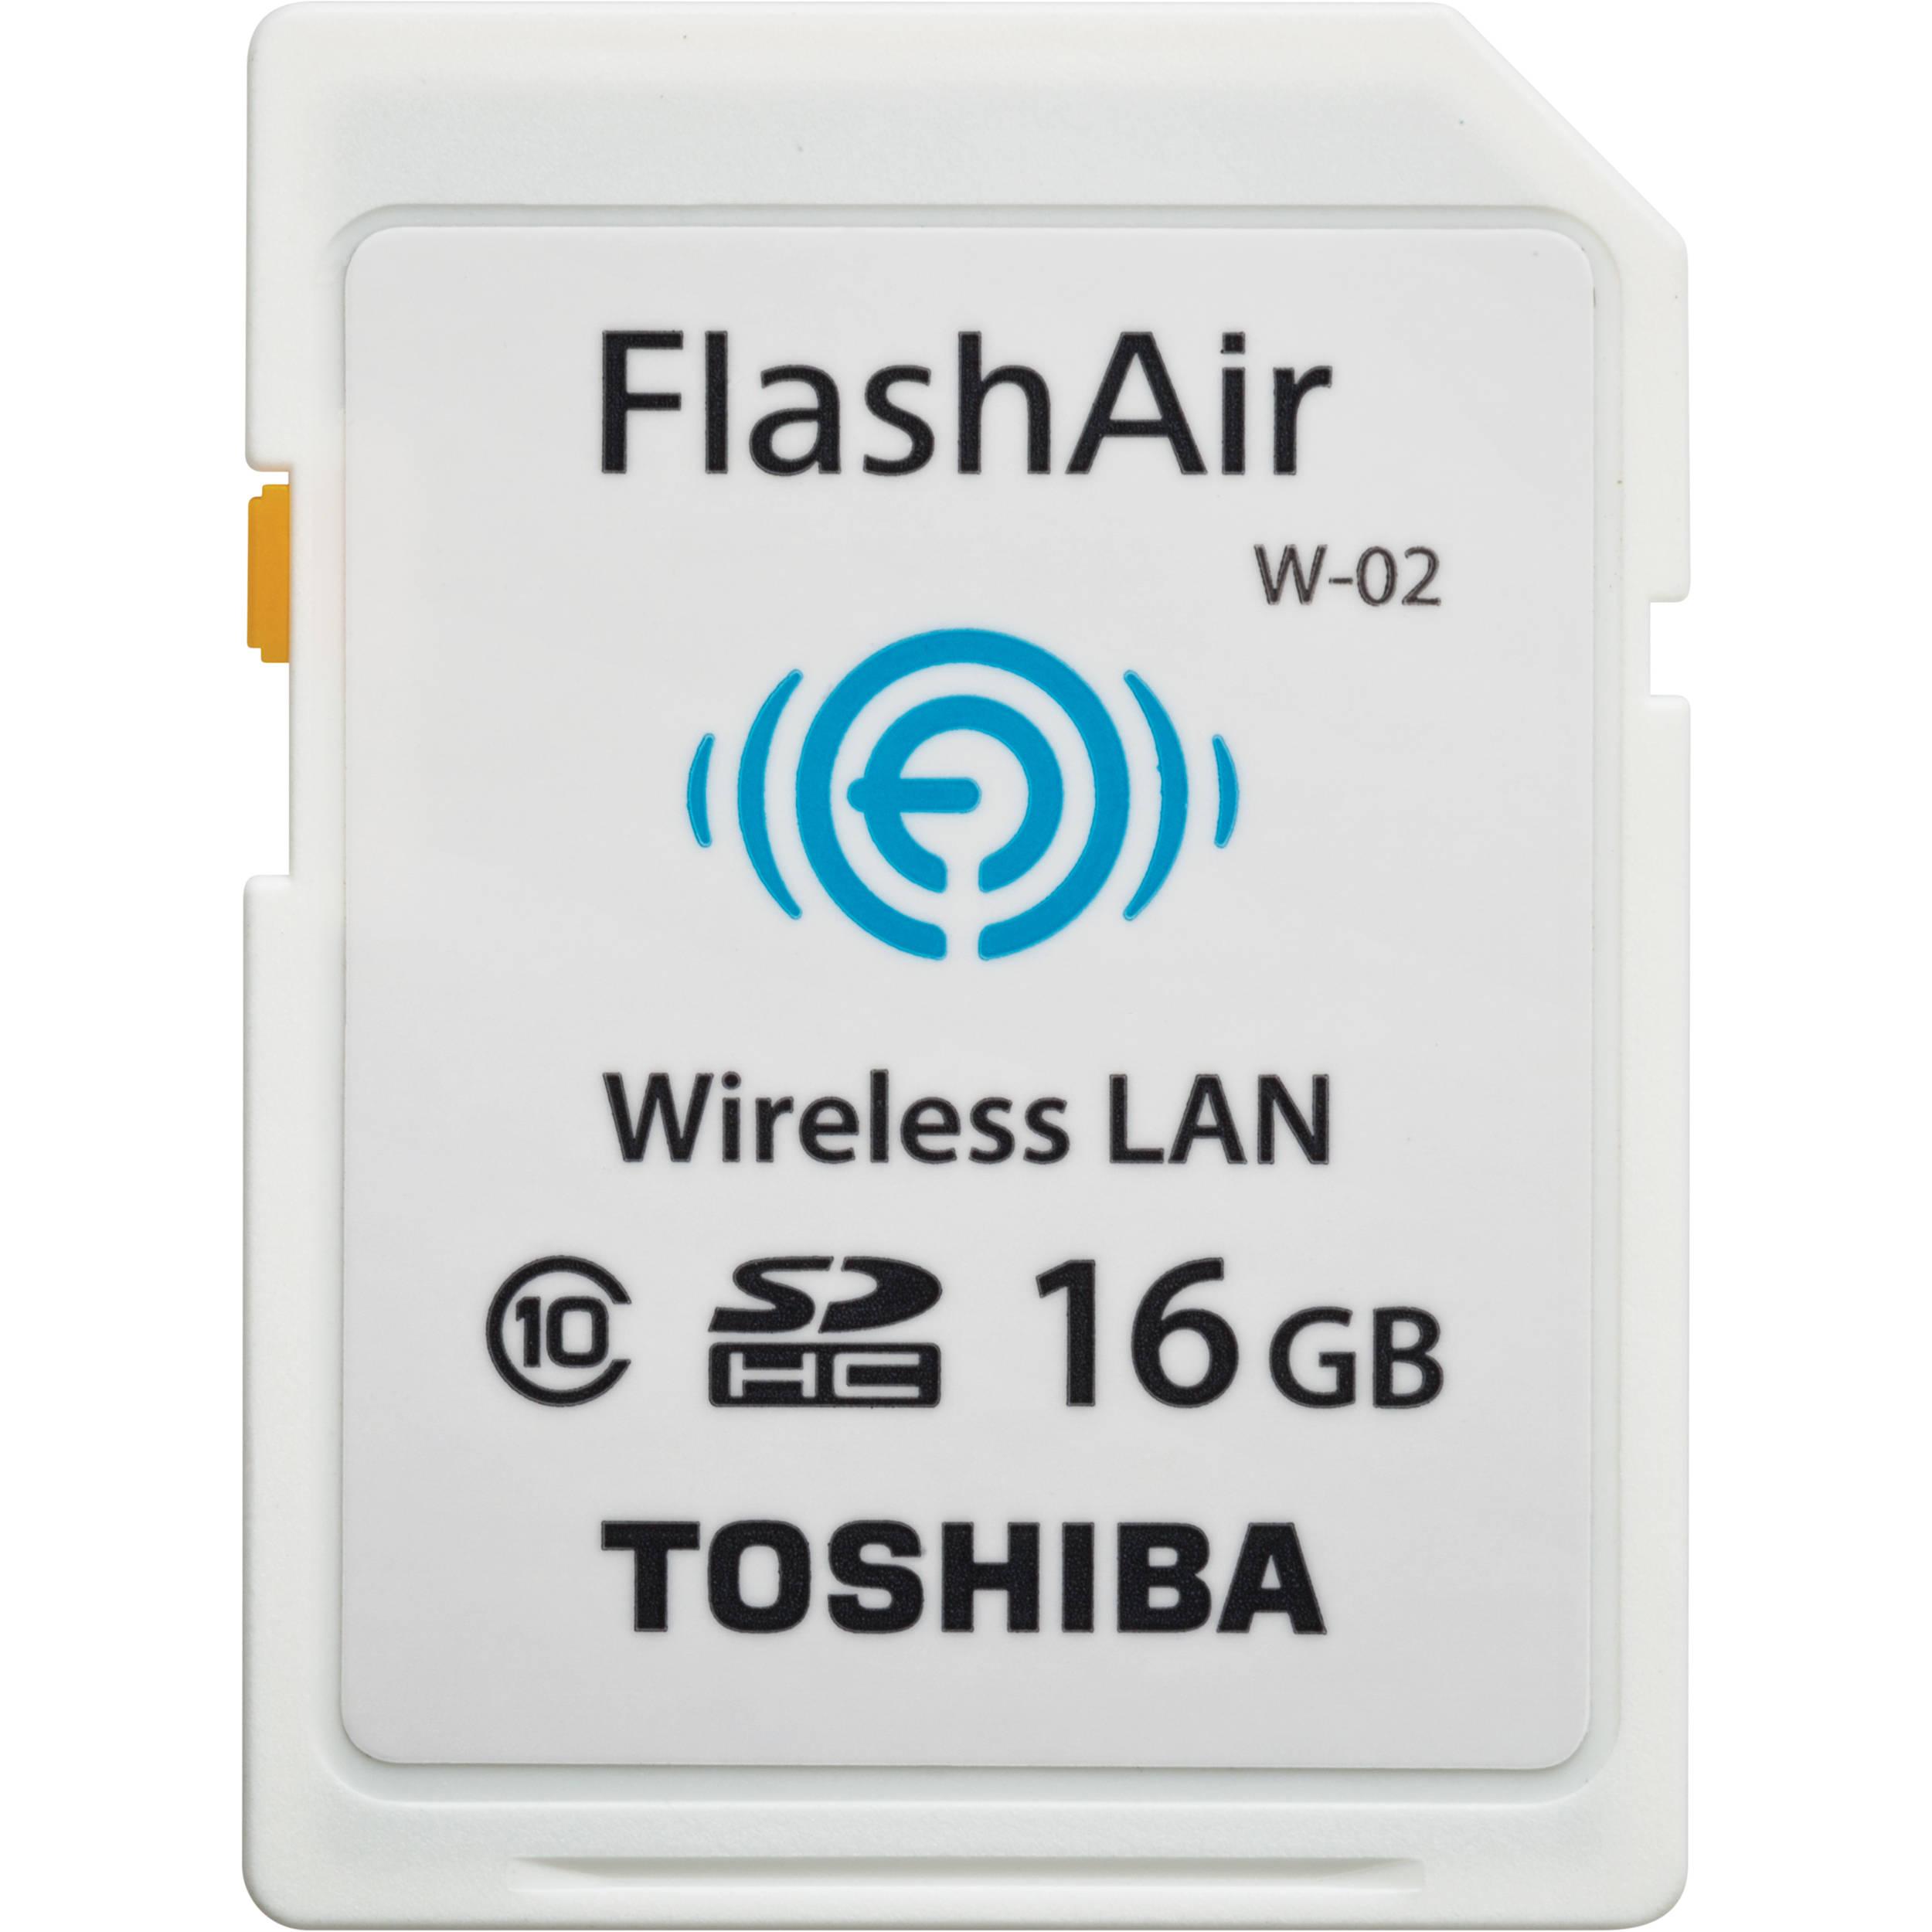 toshiba flashair w-03 firmware update